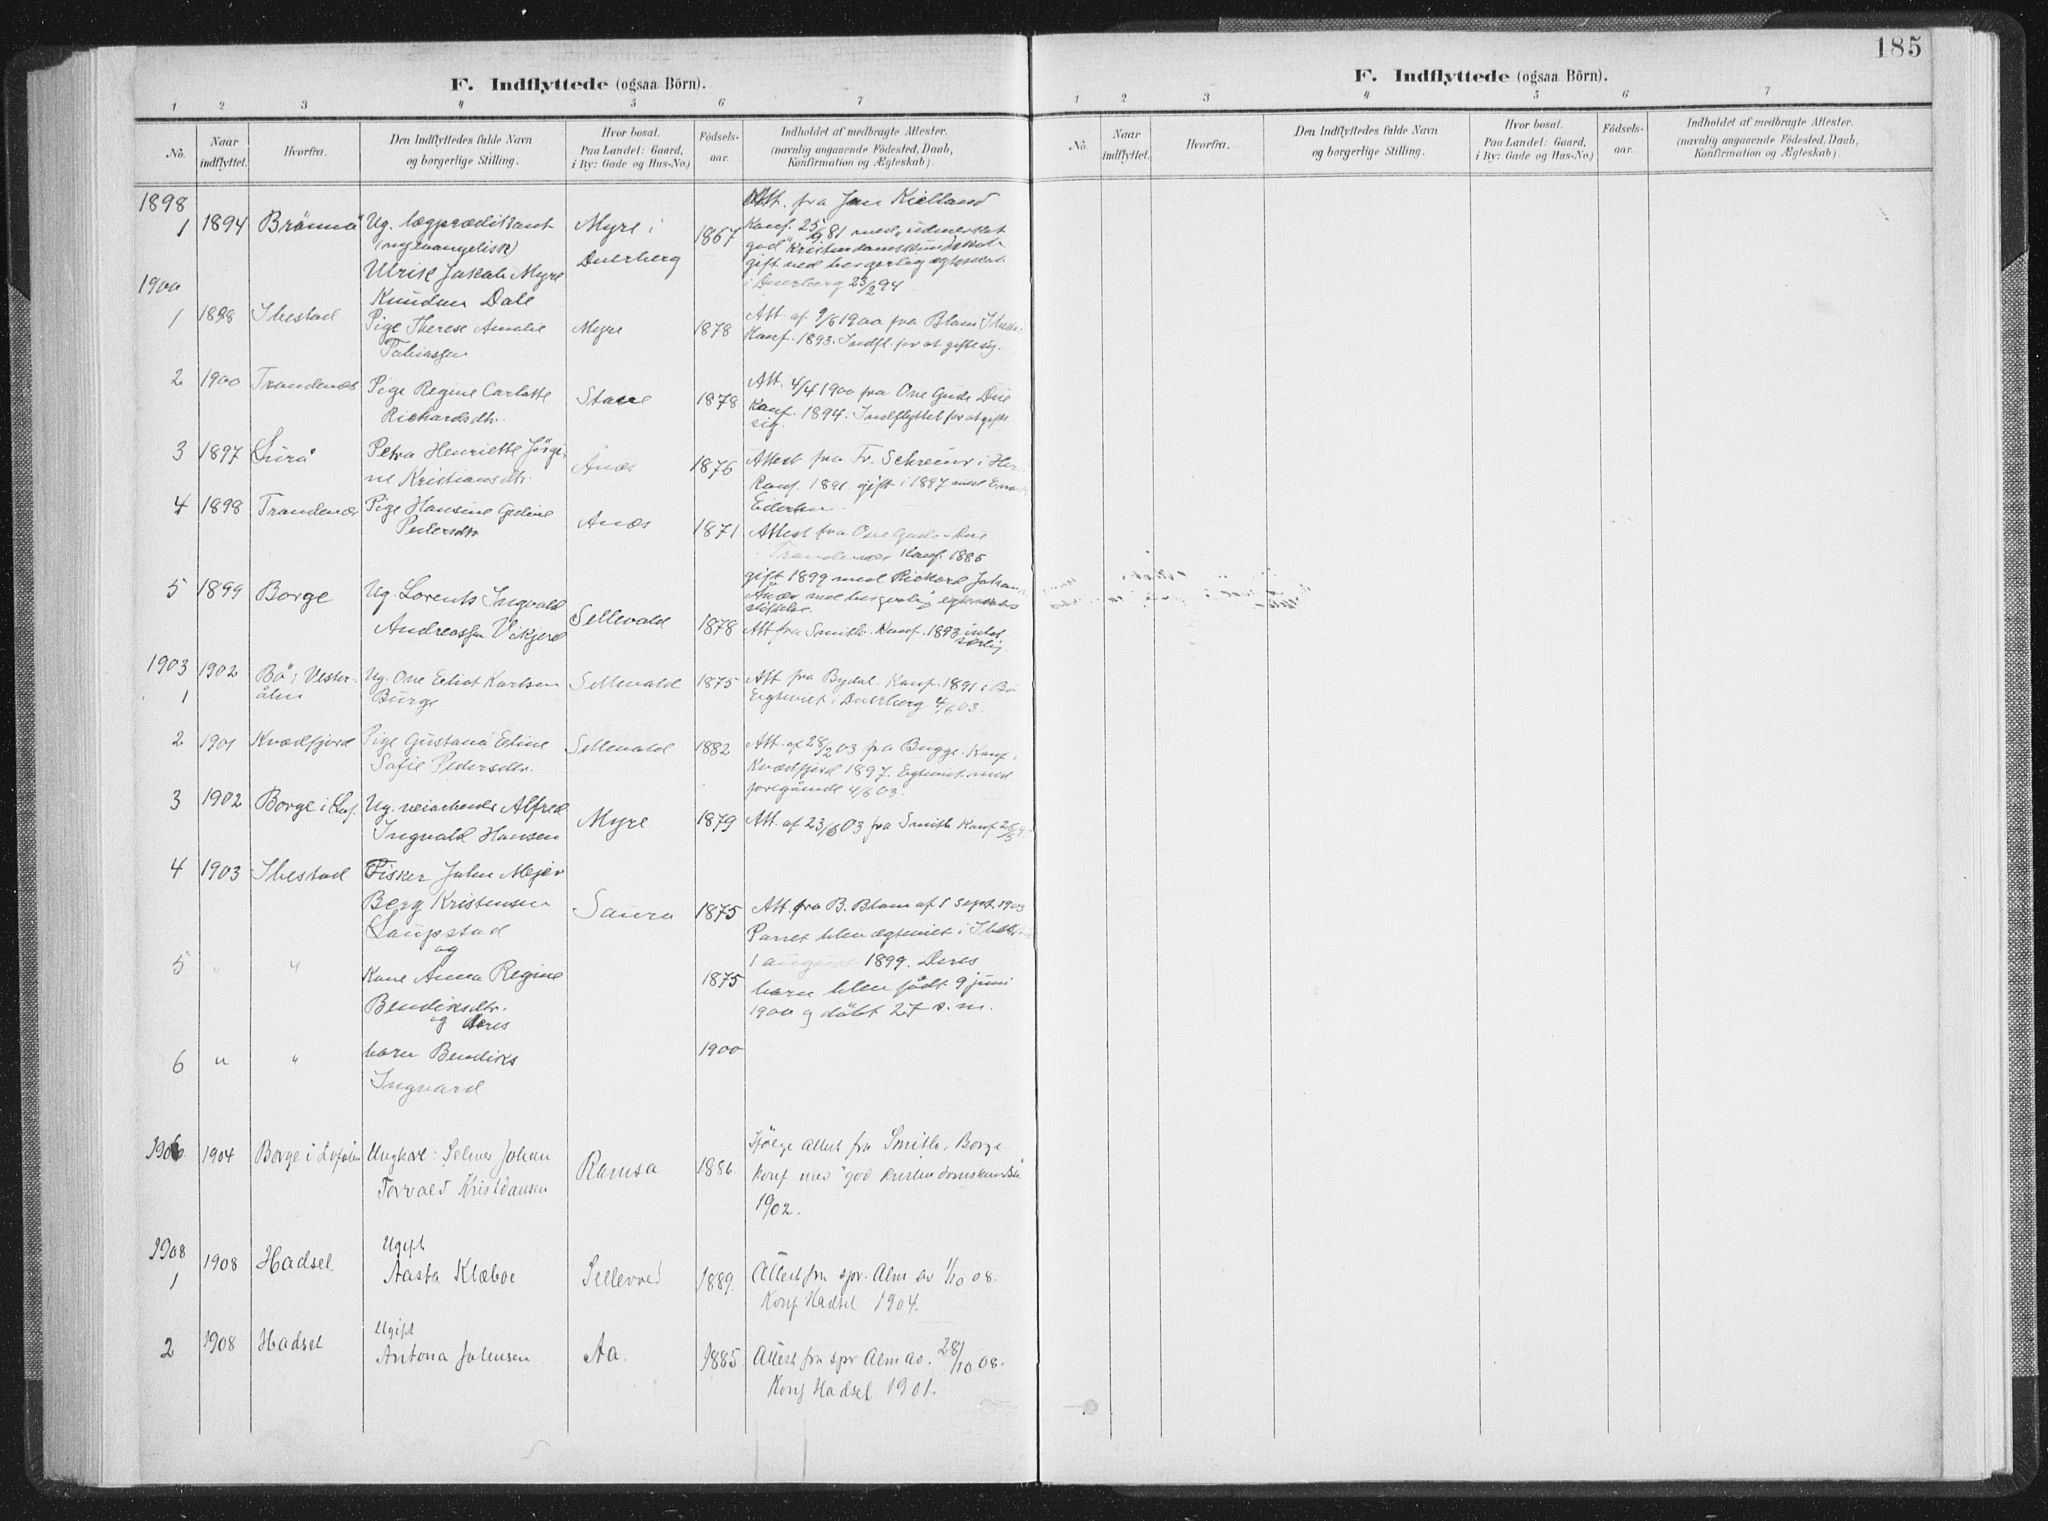 SAT, Ministerialprotokoller, klokkerbøker og fødselsregistre - Nordland, 897/L1400: Ministerialbok nr. 897A07, 1897-1908, s. 185